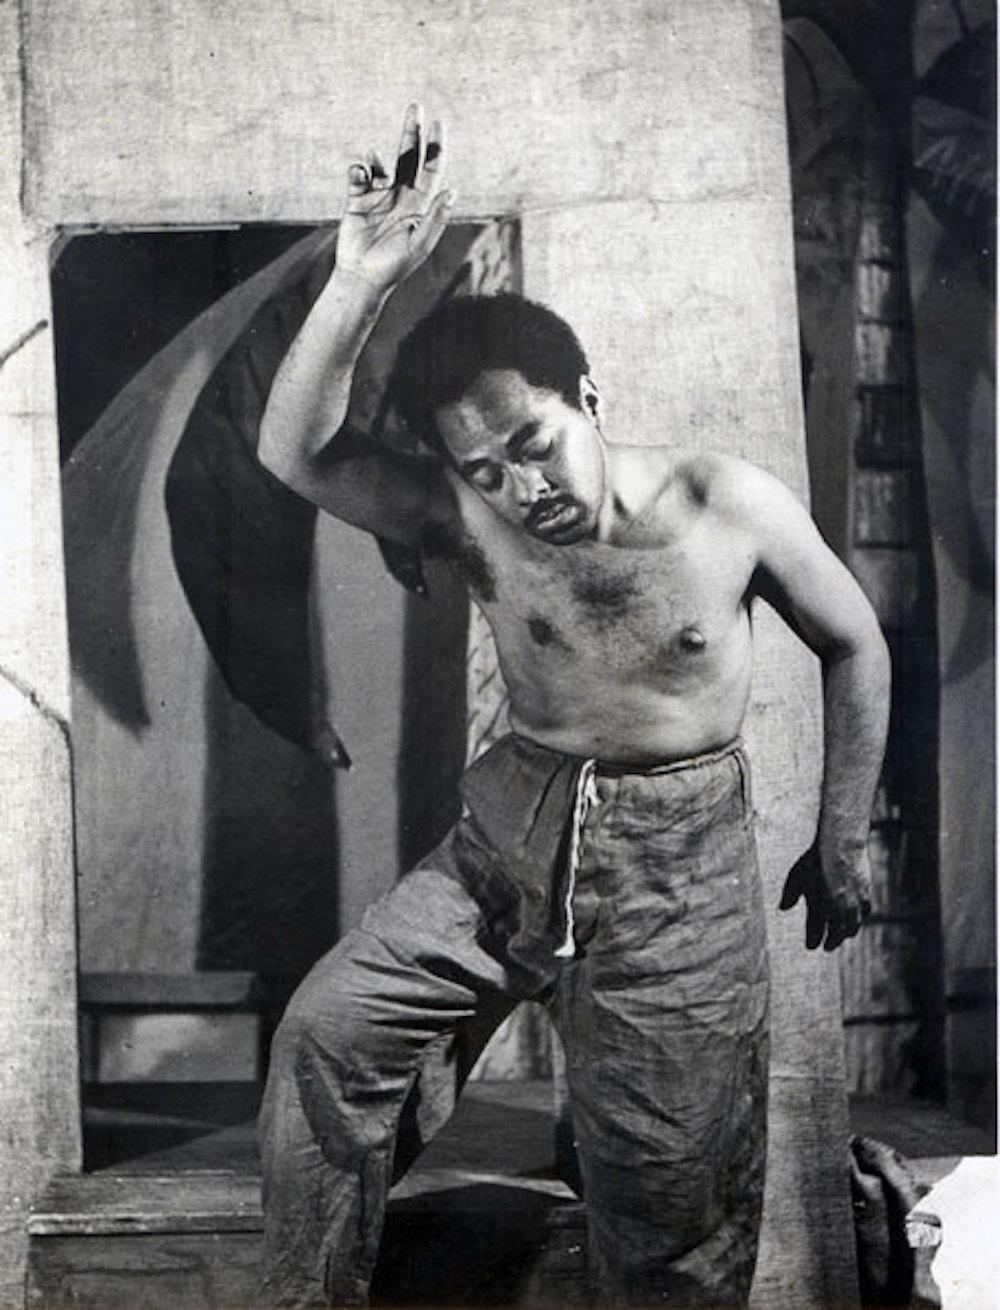 Abdias Nascimento performs in a play by Teatro Experimental do Negro Ph: Cortesia [Courtesy] Ipeafro.